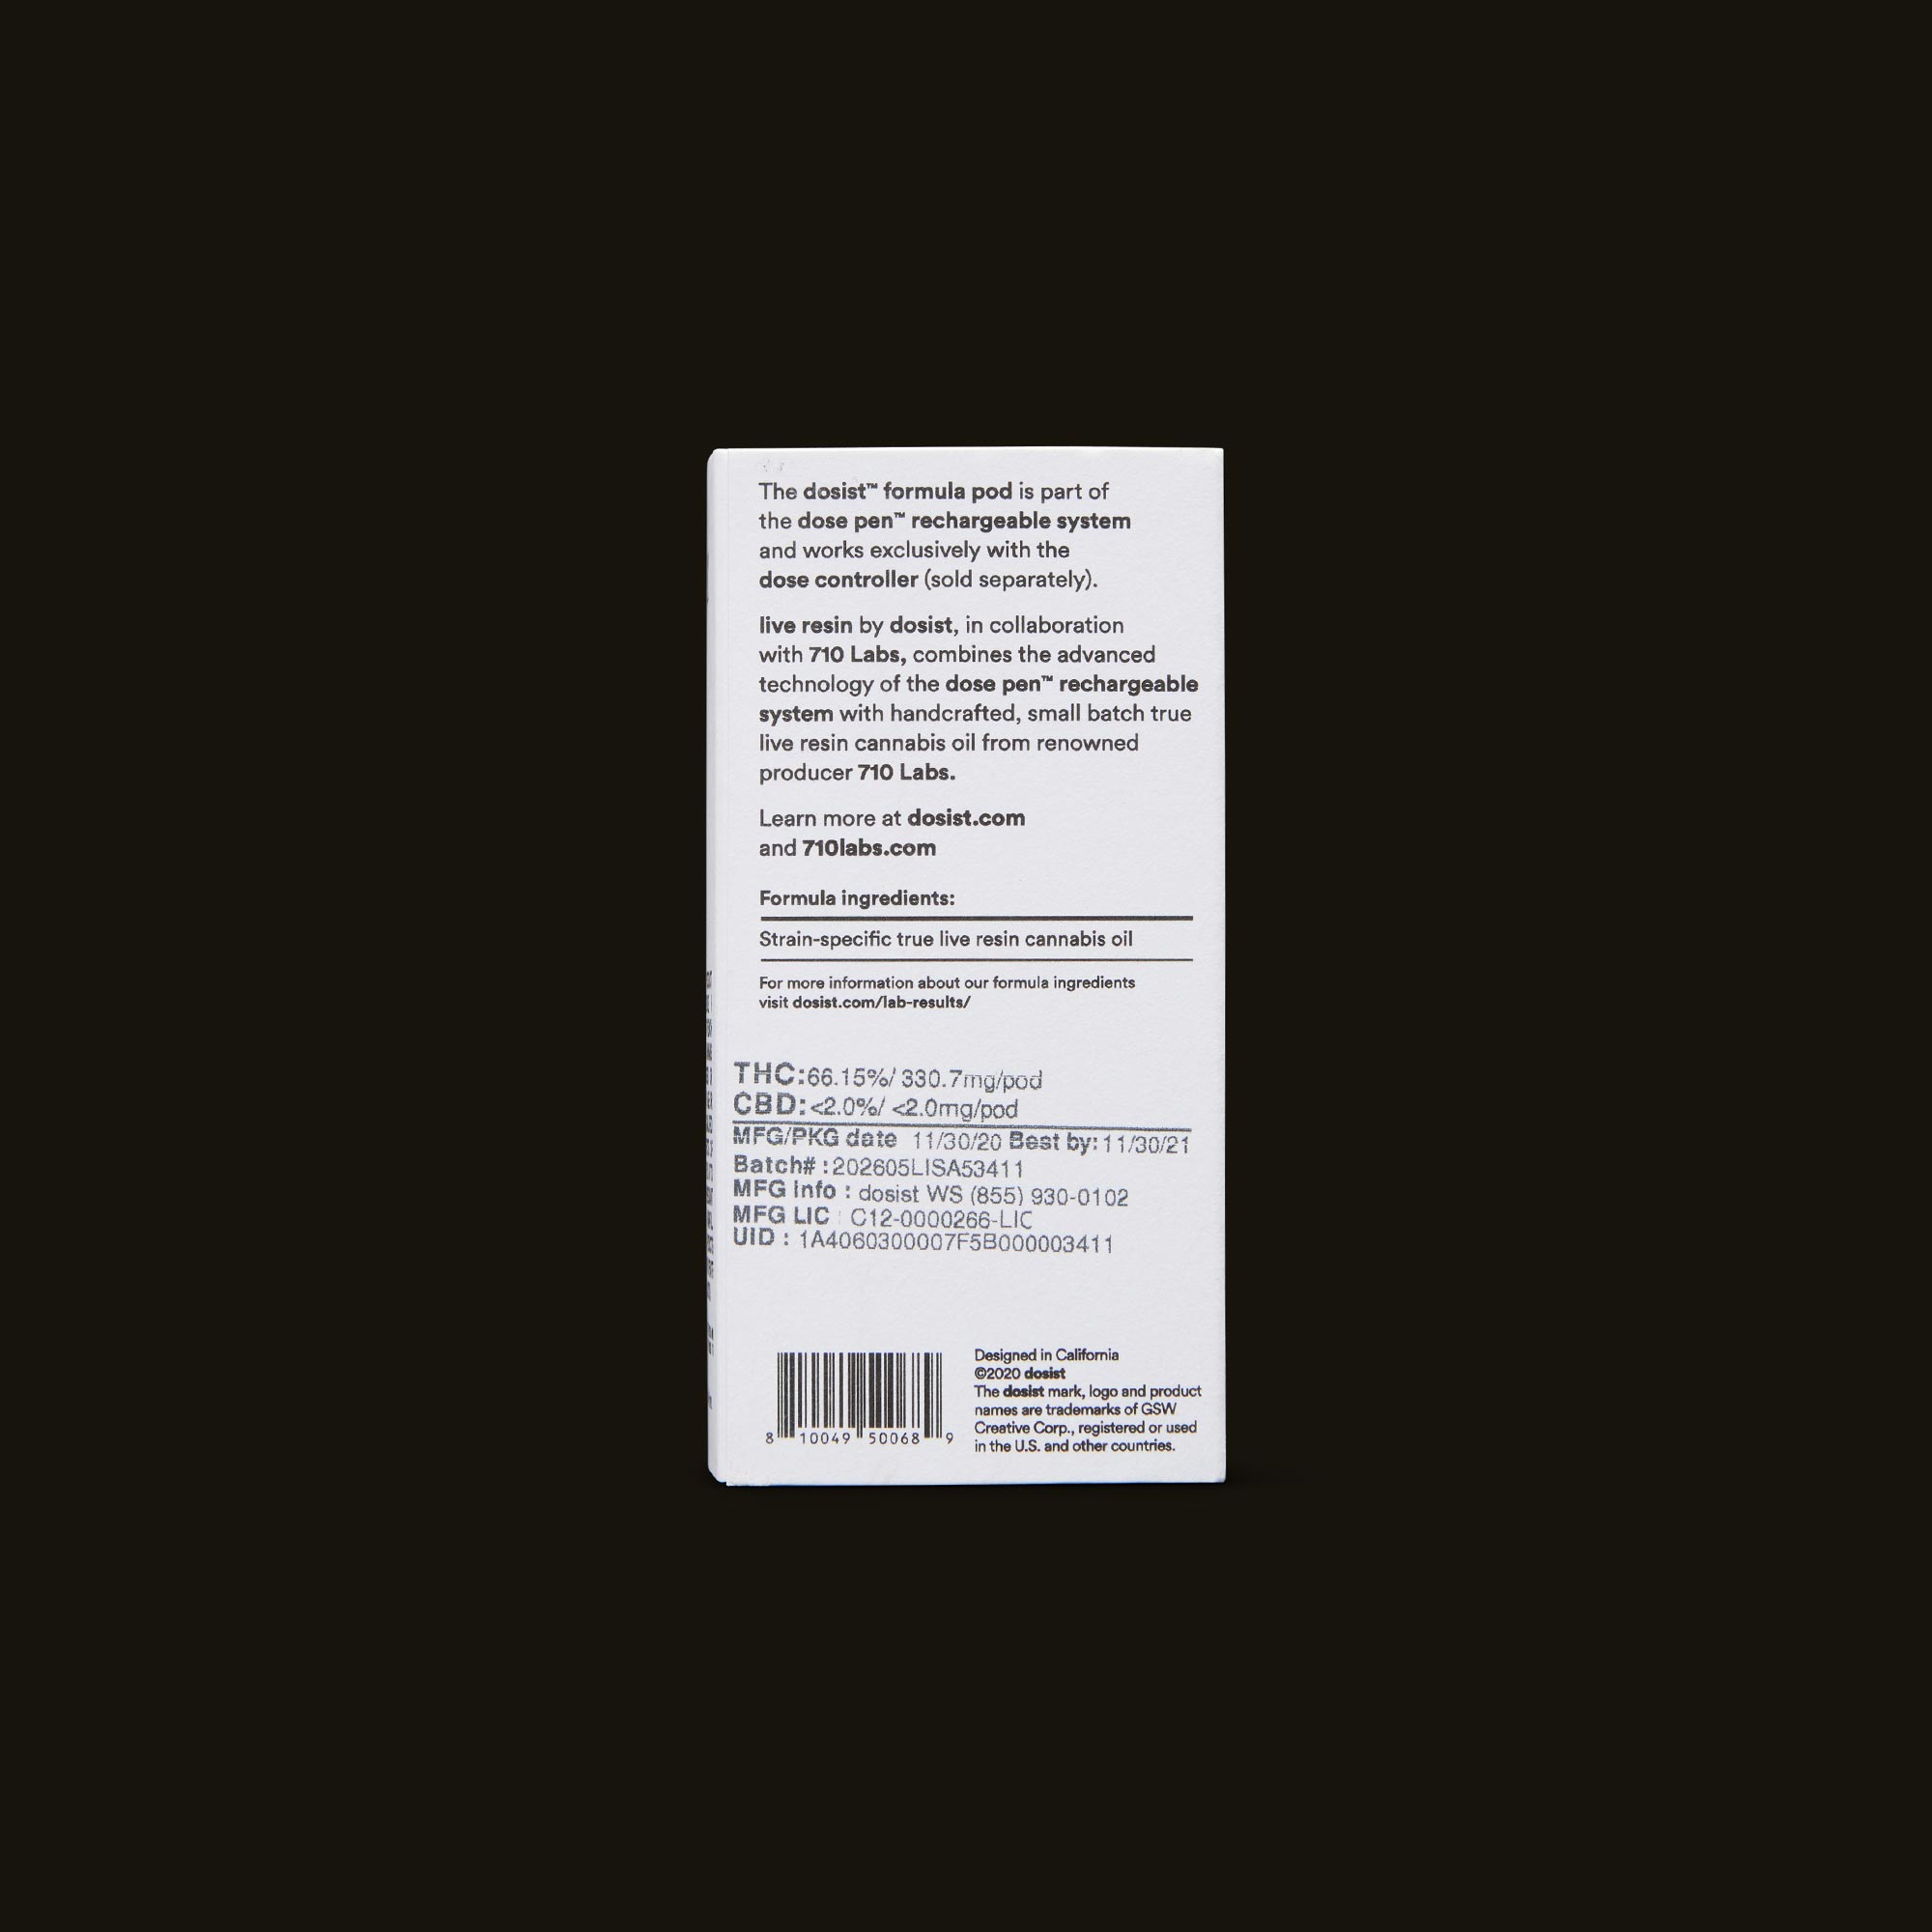 dosist Lemon Tart Pucker Live Resin formula pod Back Packaging